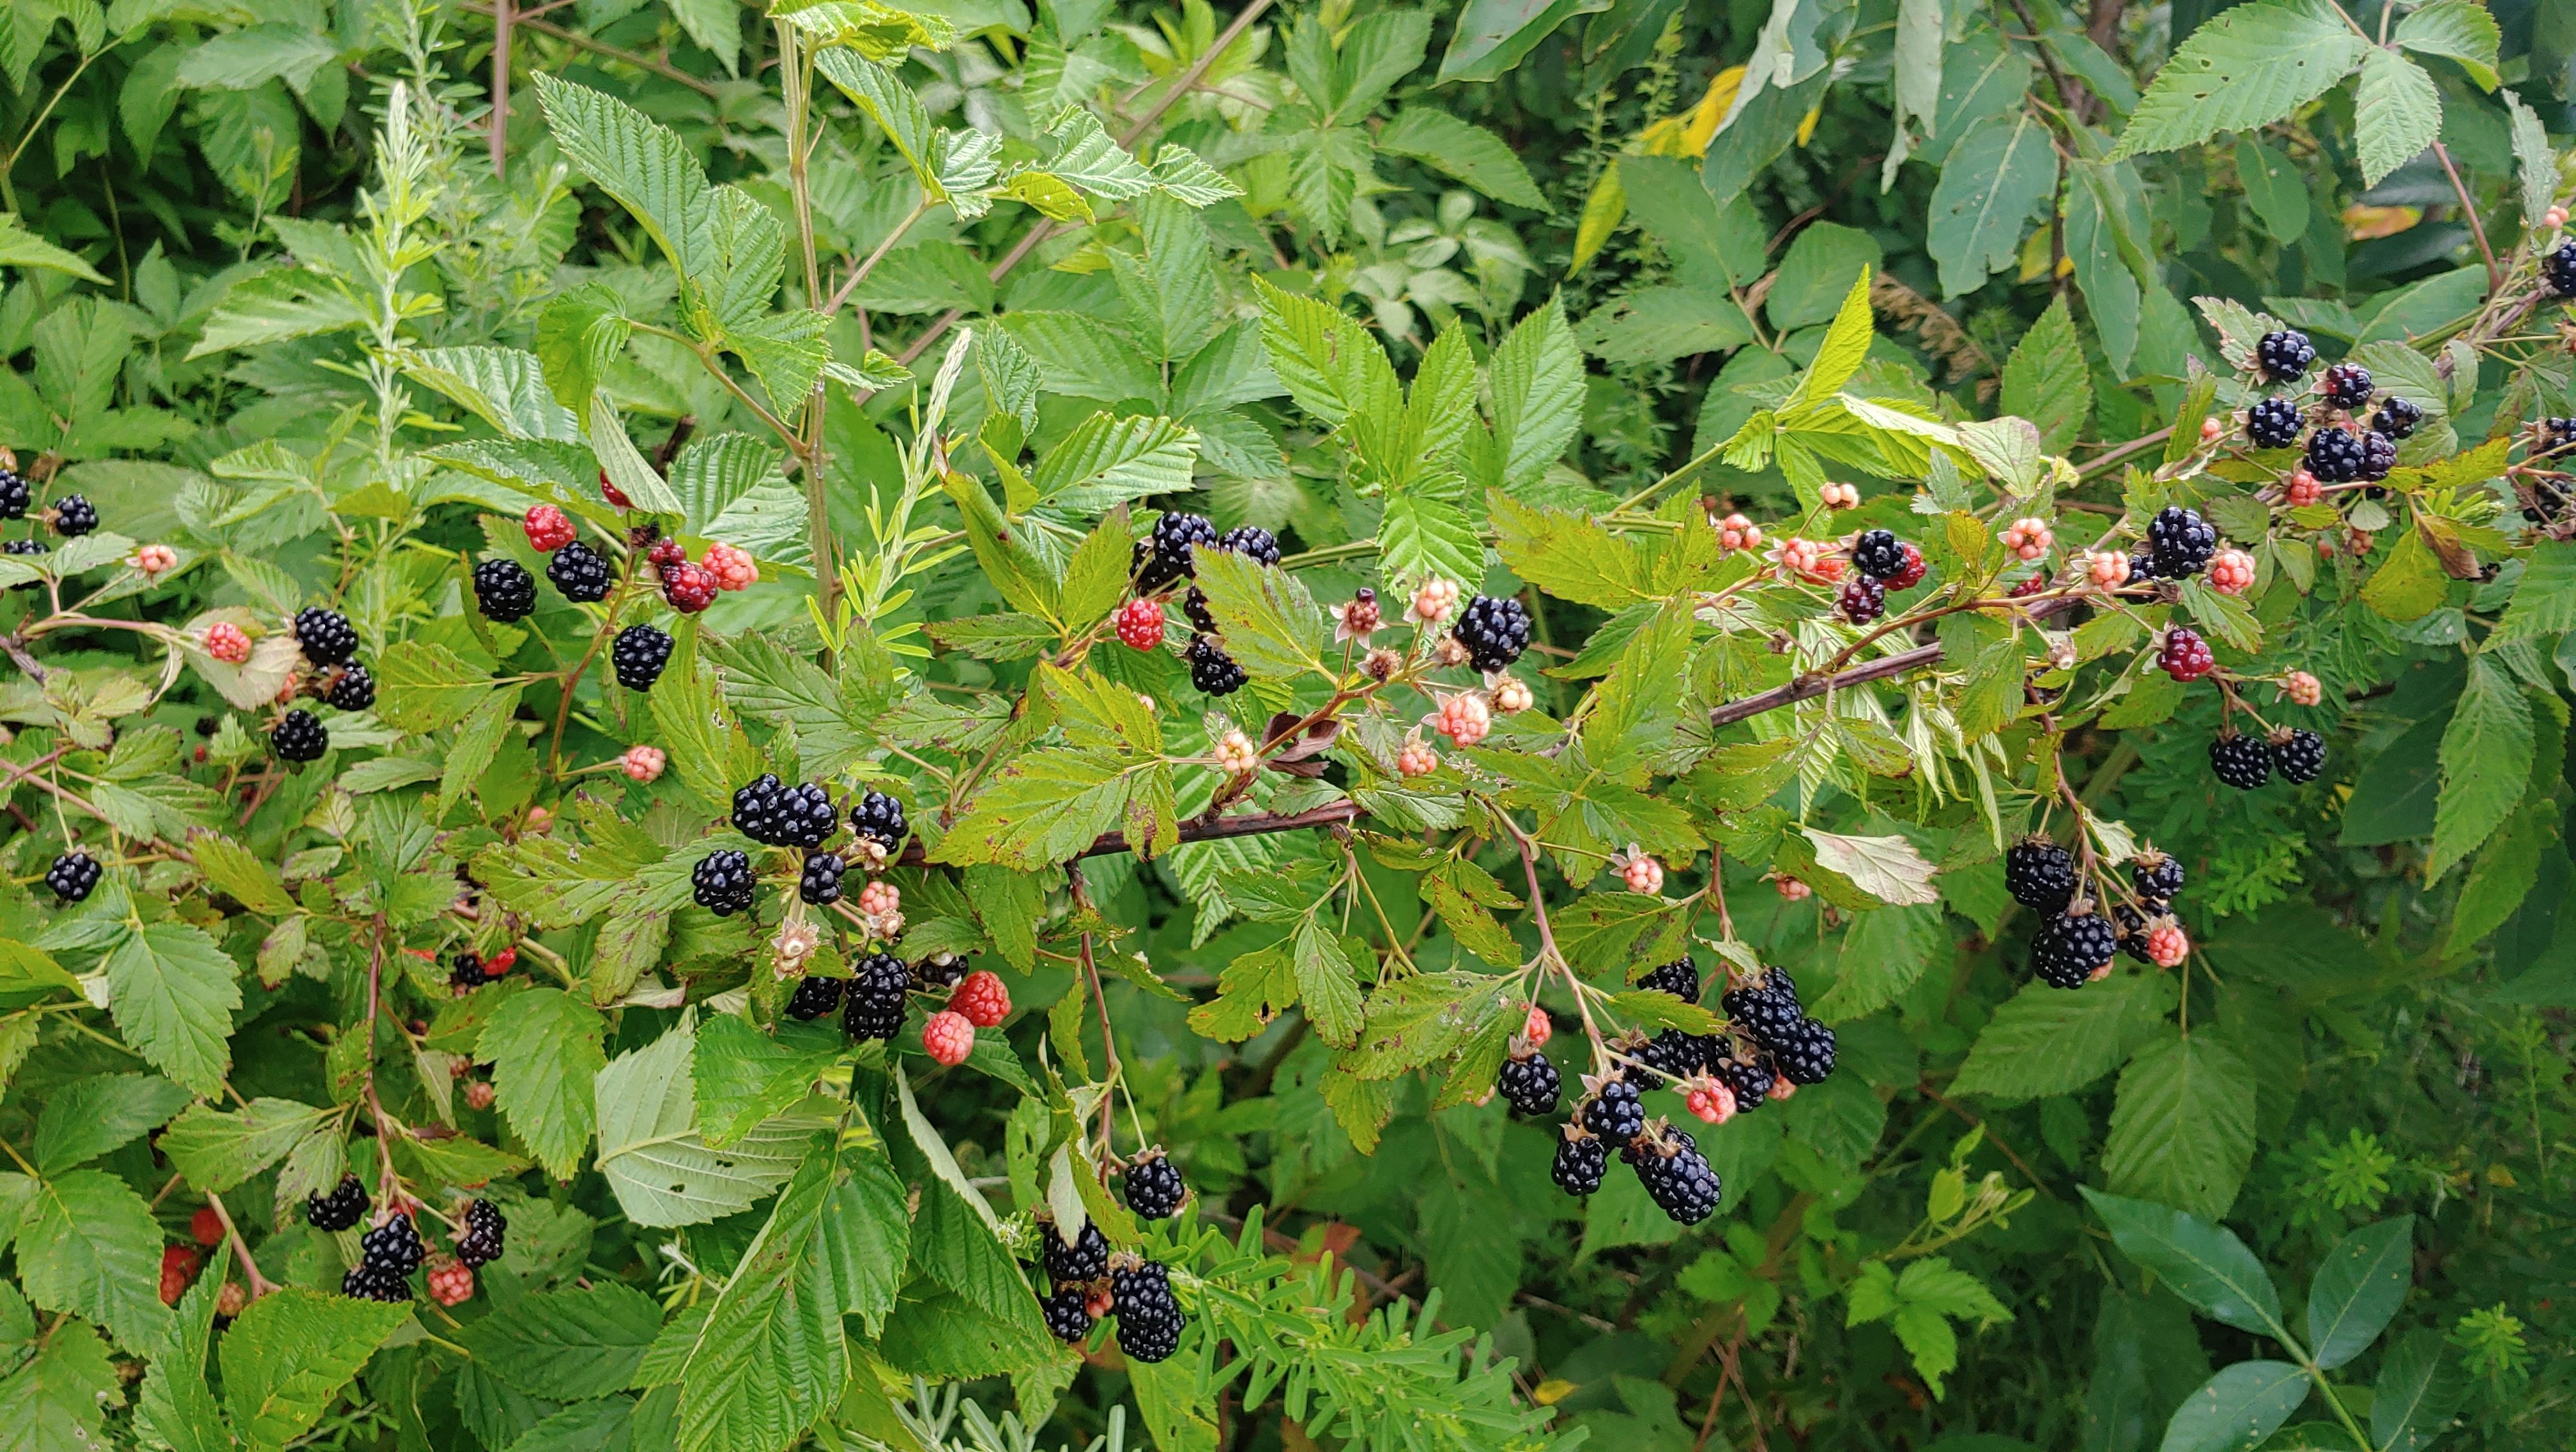 Wild Thorny Blackberries